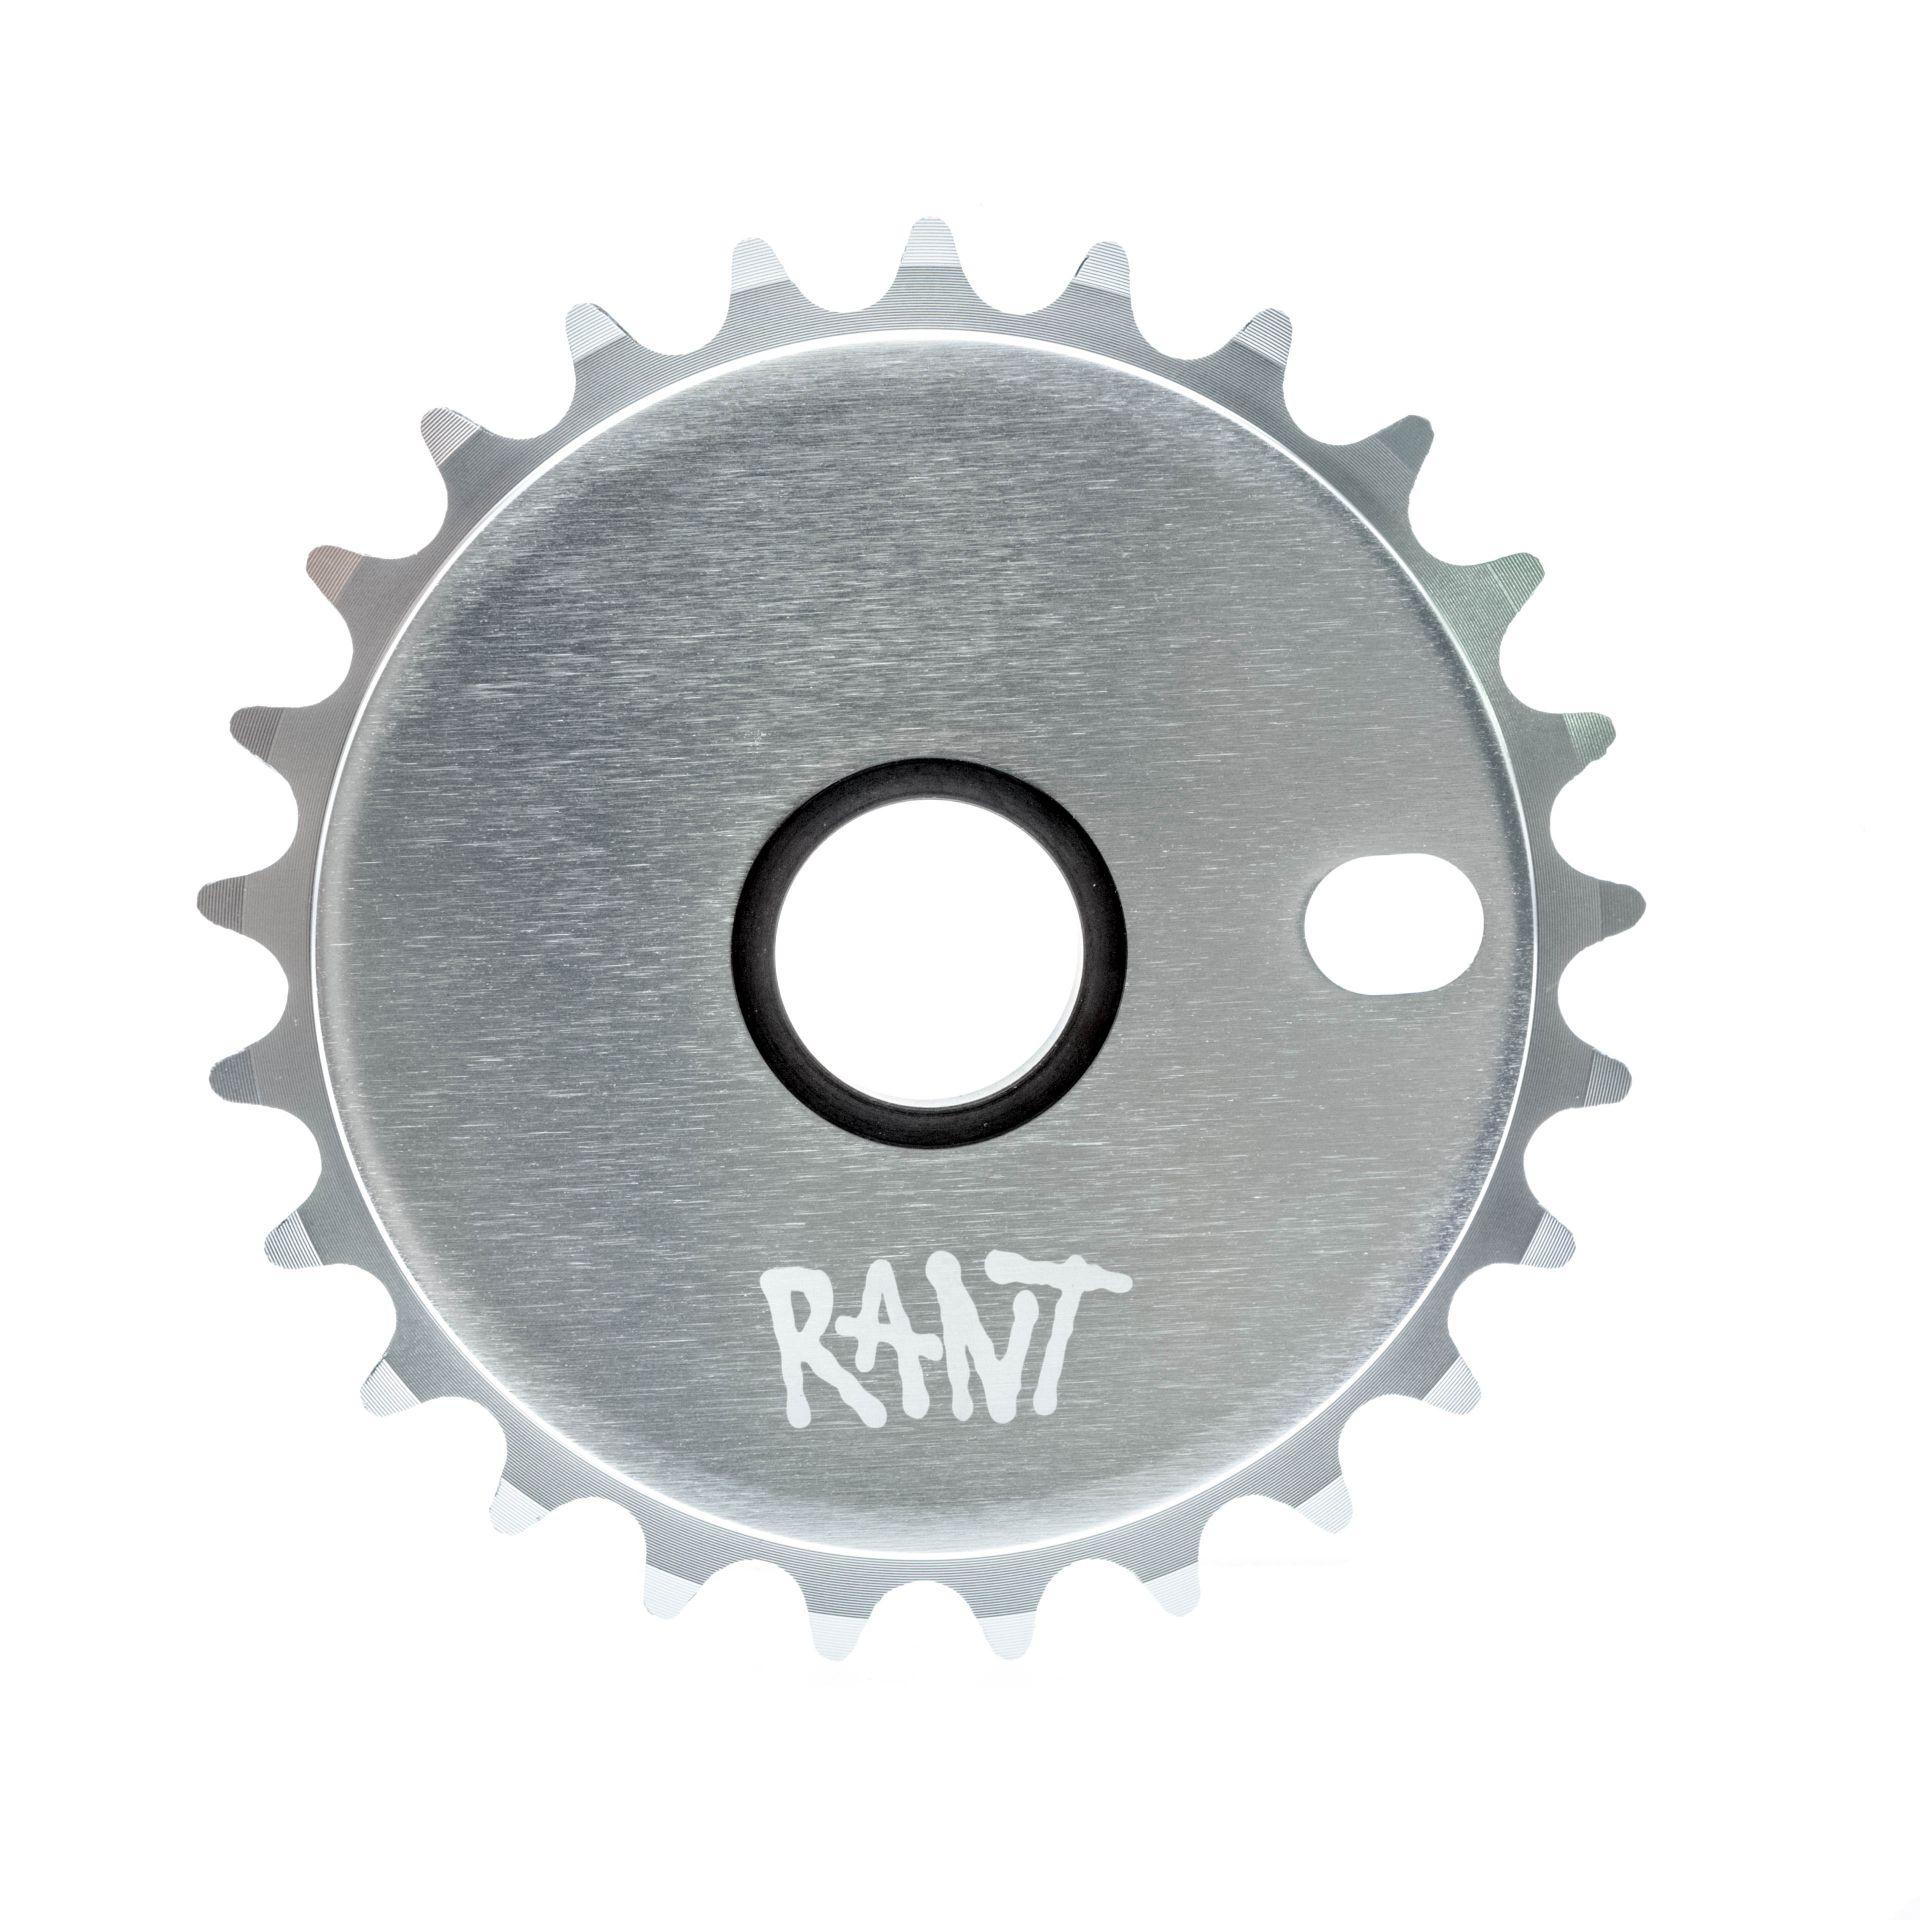 Couronne BMX Rant Stick'Em Sprocket 25 dts Argent